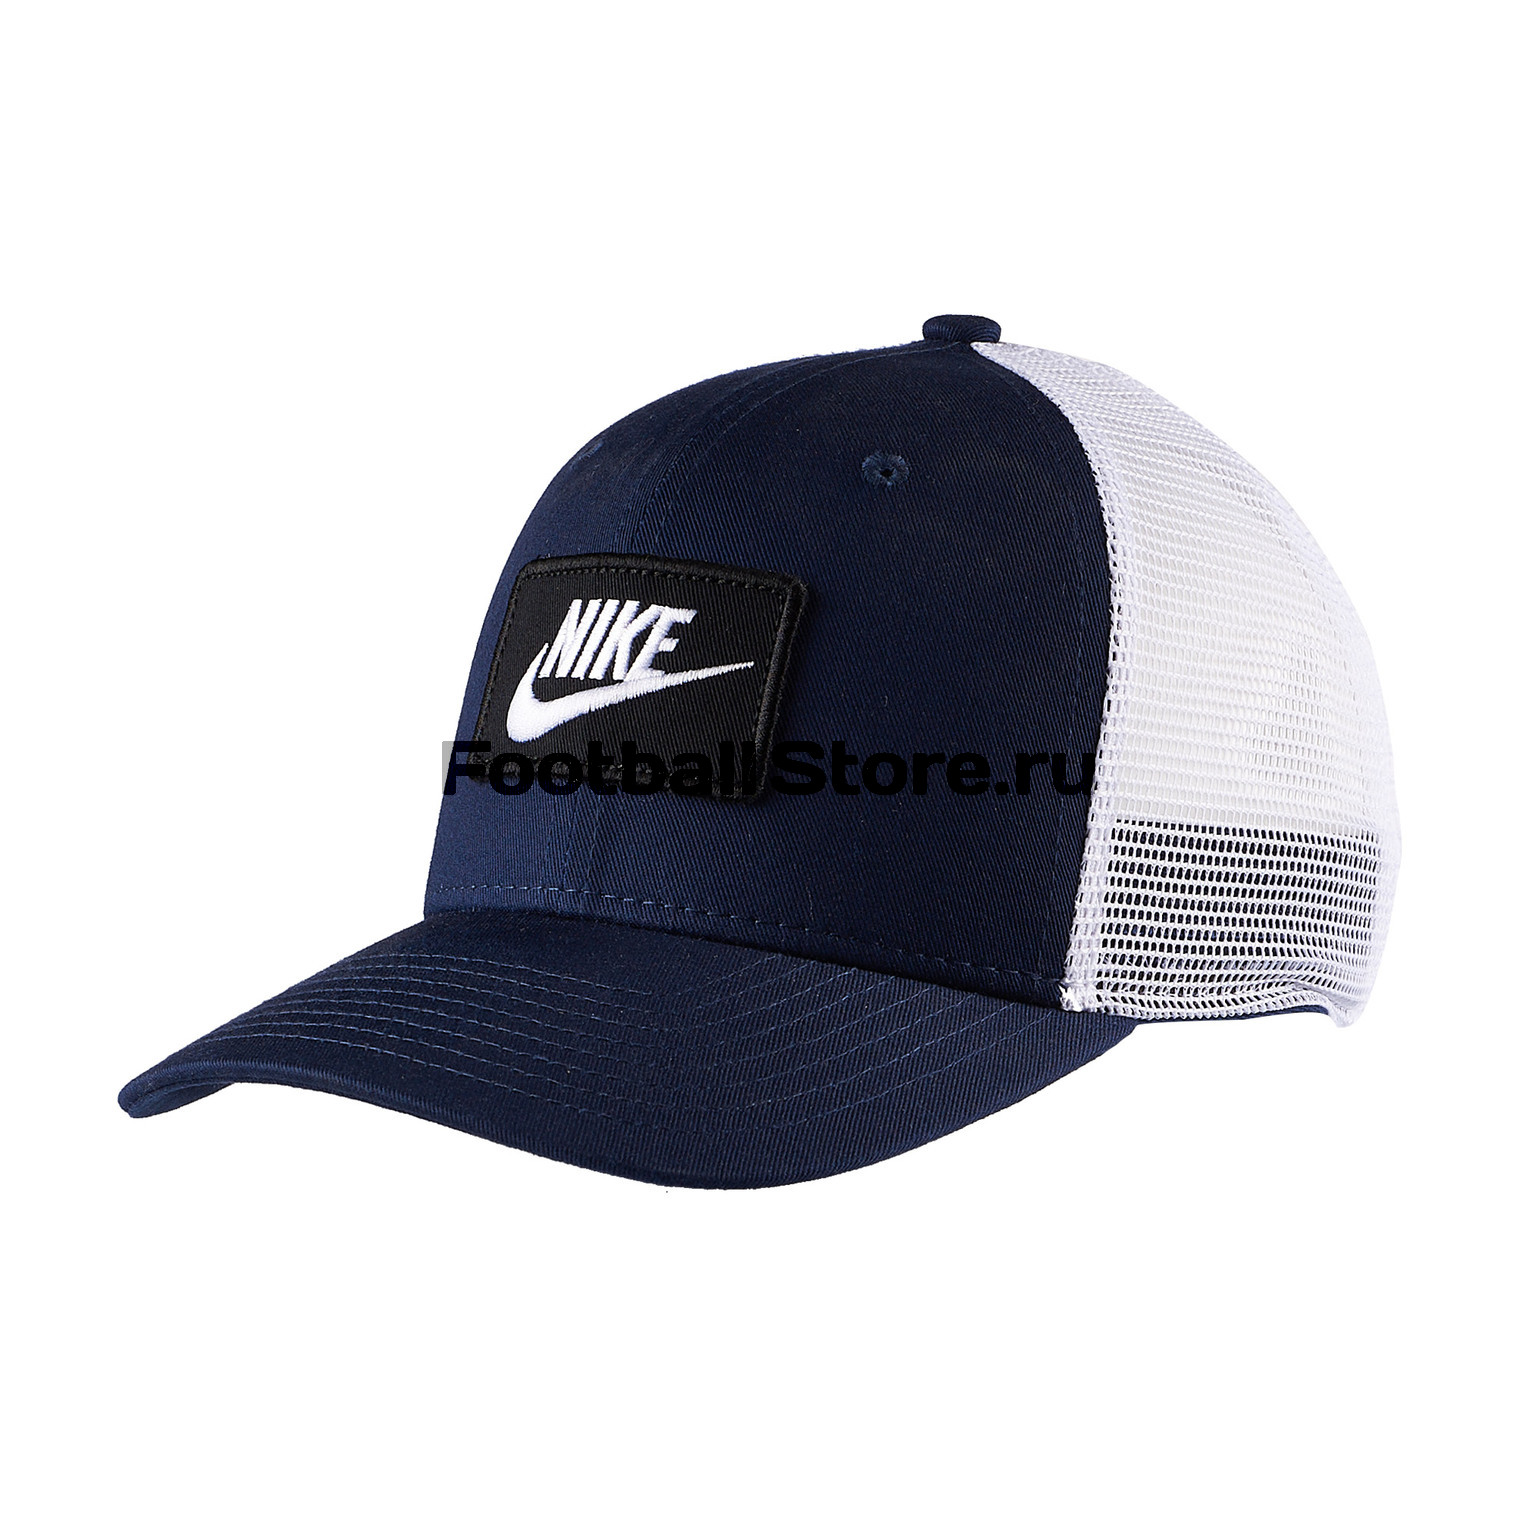 Бейсболка Nike CLC99 Cap Trucker AQ9879-451 new baseball cap men ghost embroidery new dad hat golf usa snapback hip hop trucker cap men gorro drake bone 2017